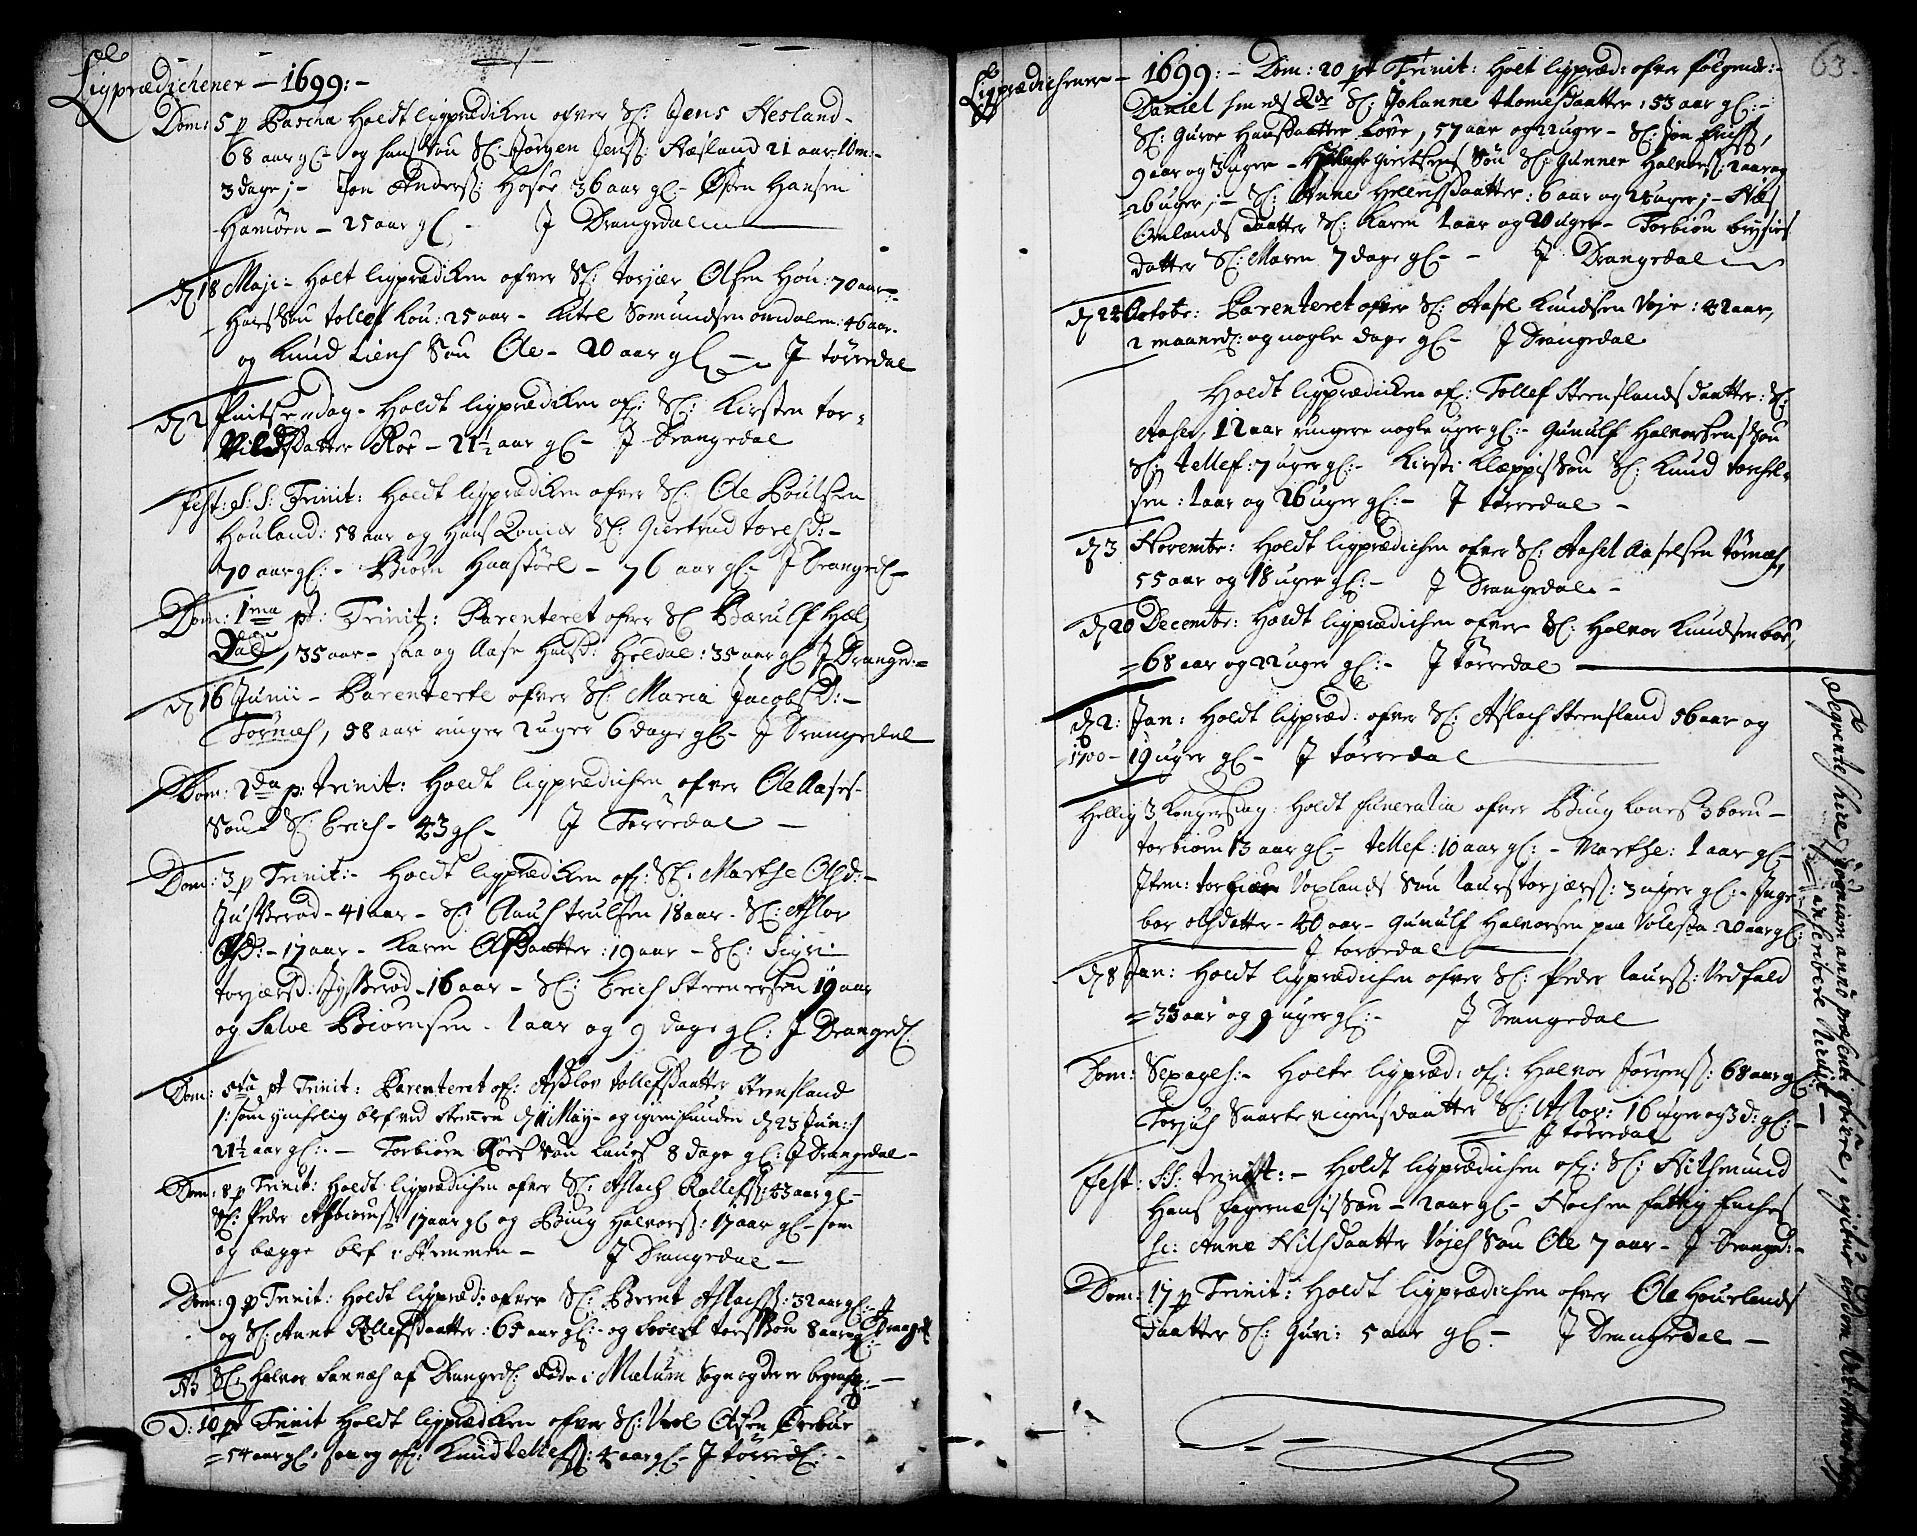 SAKO, Drangedal kirkebøker, F/Fa/L0001: Ministerialbok nr. 1, 1697-1767, s. 63